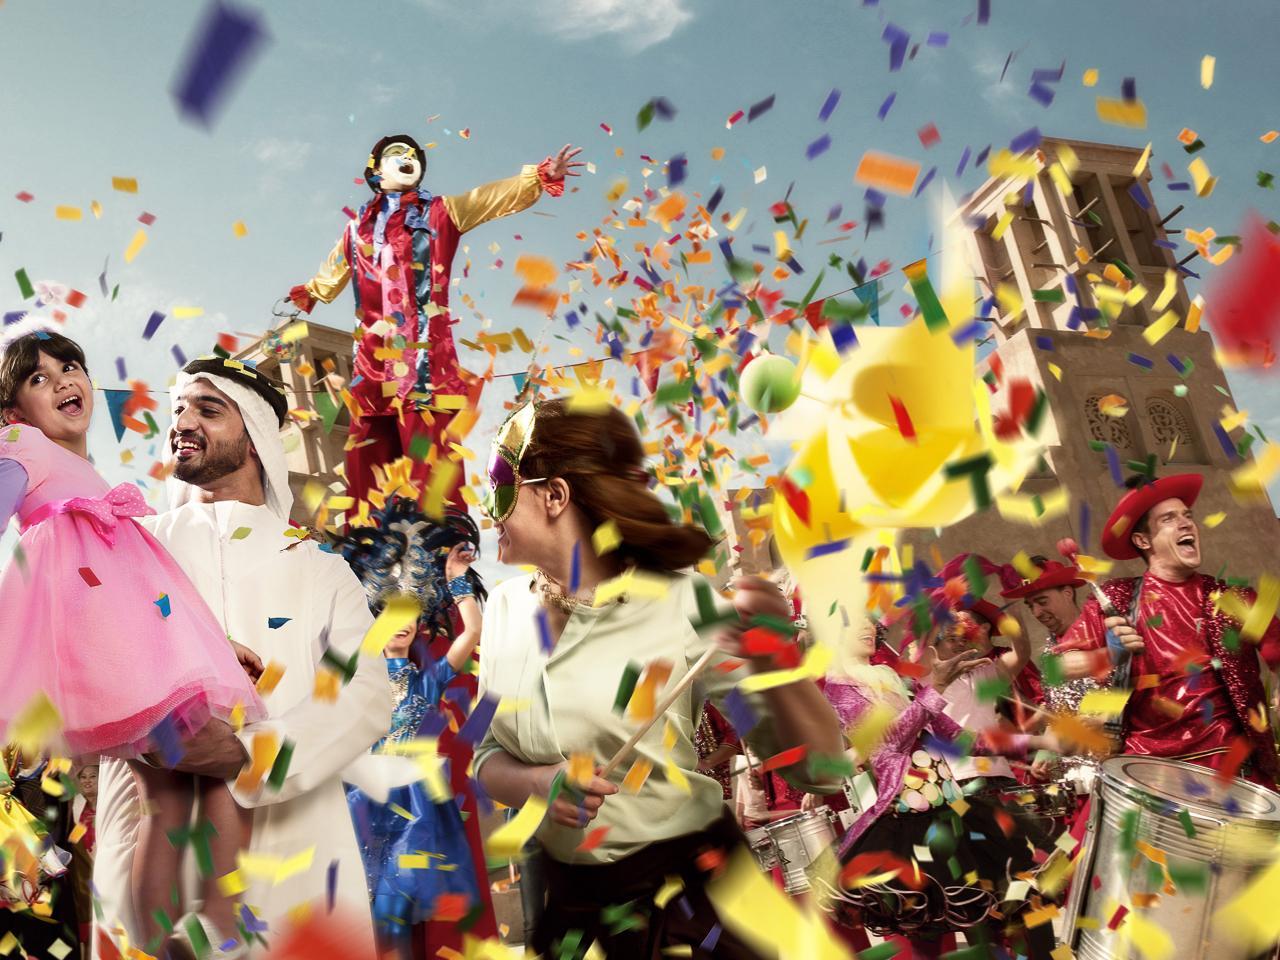 Летний фестиваль в дубае 2014 дом в эмиратах Абу Даби Sweihan